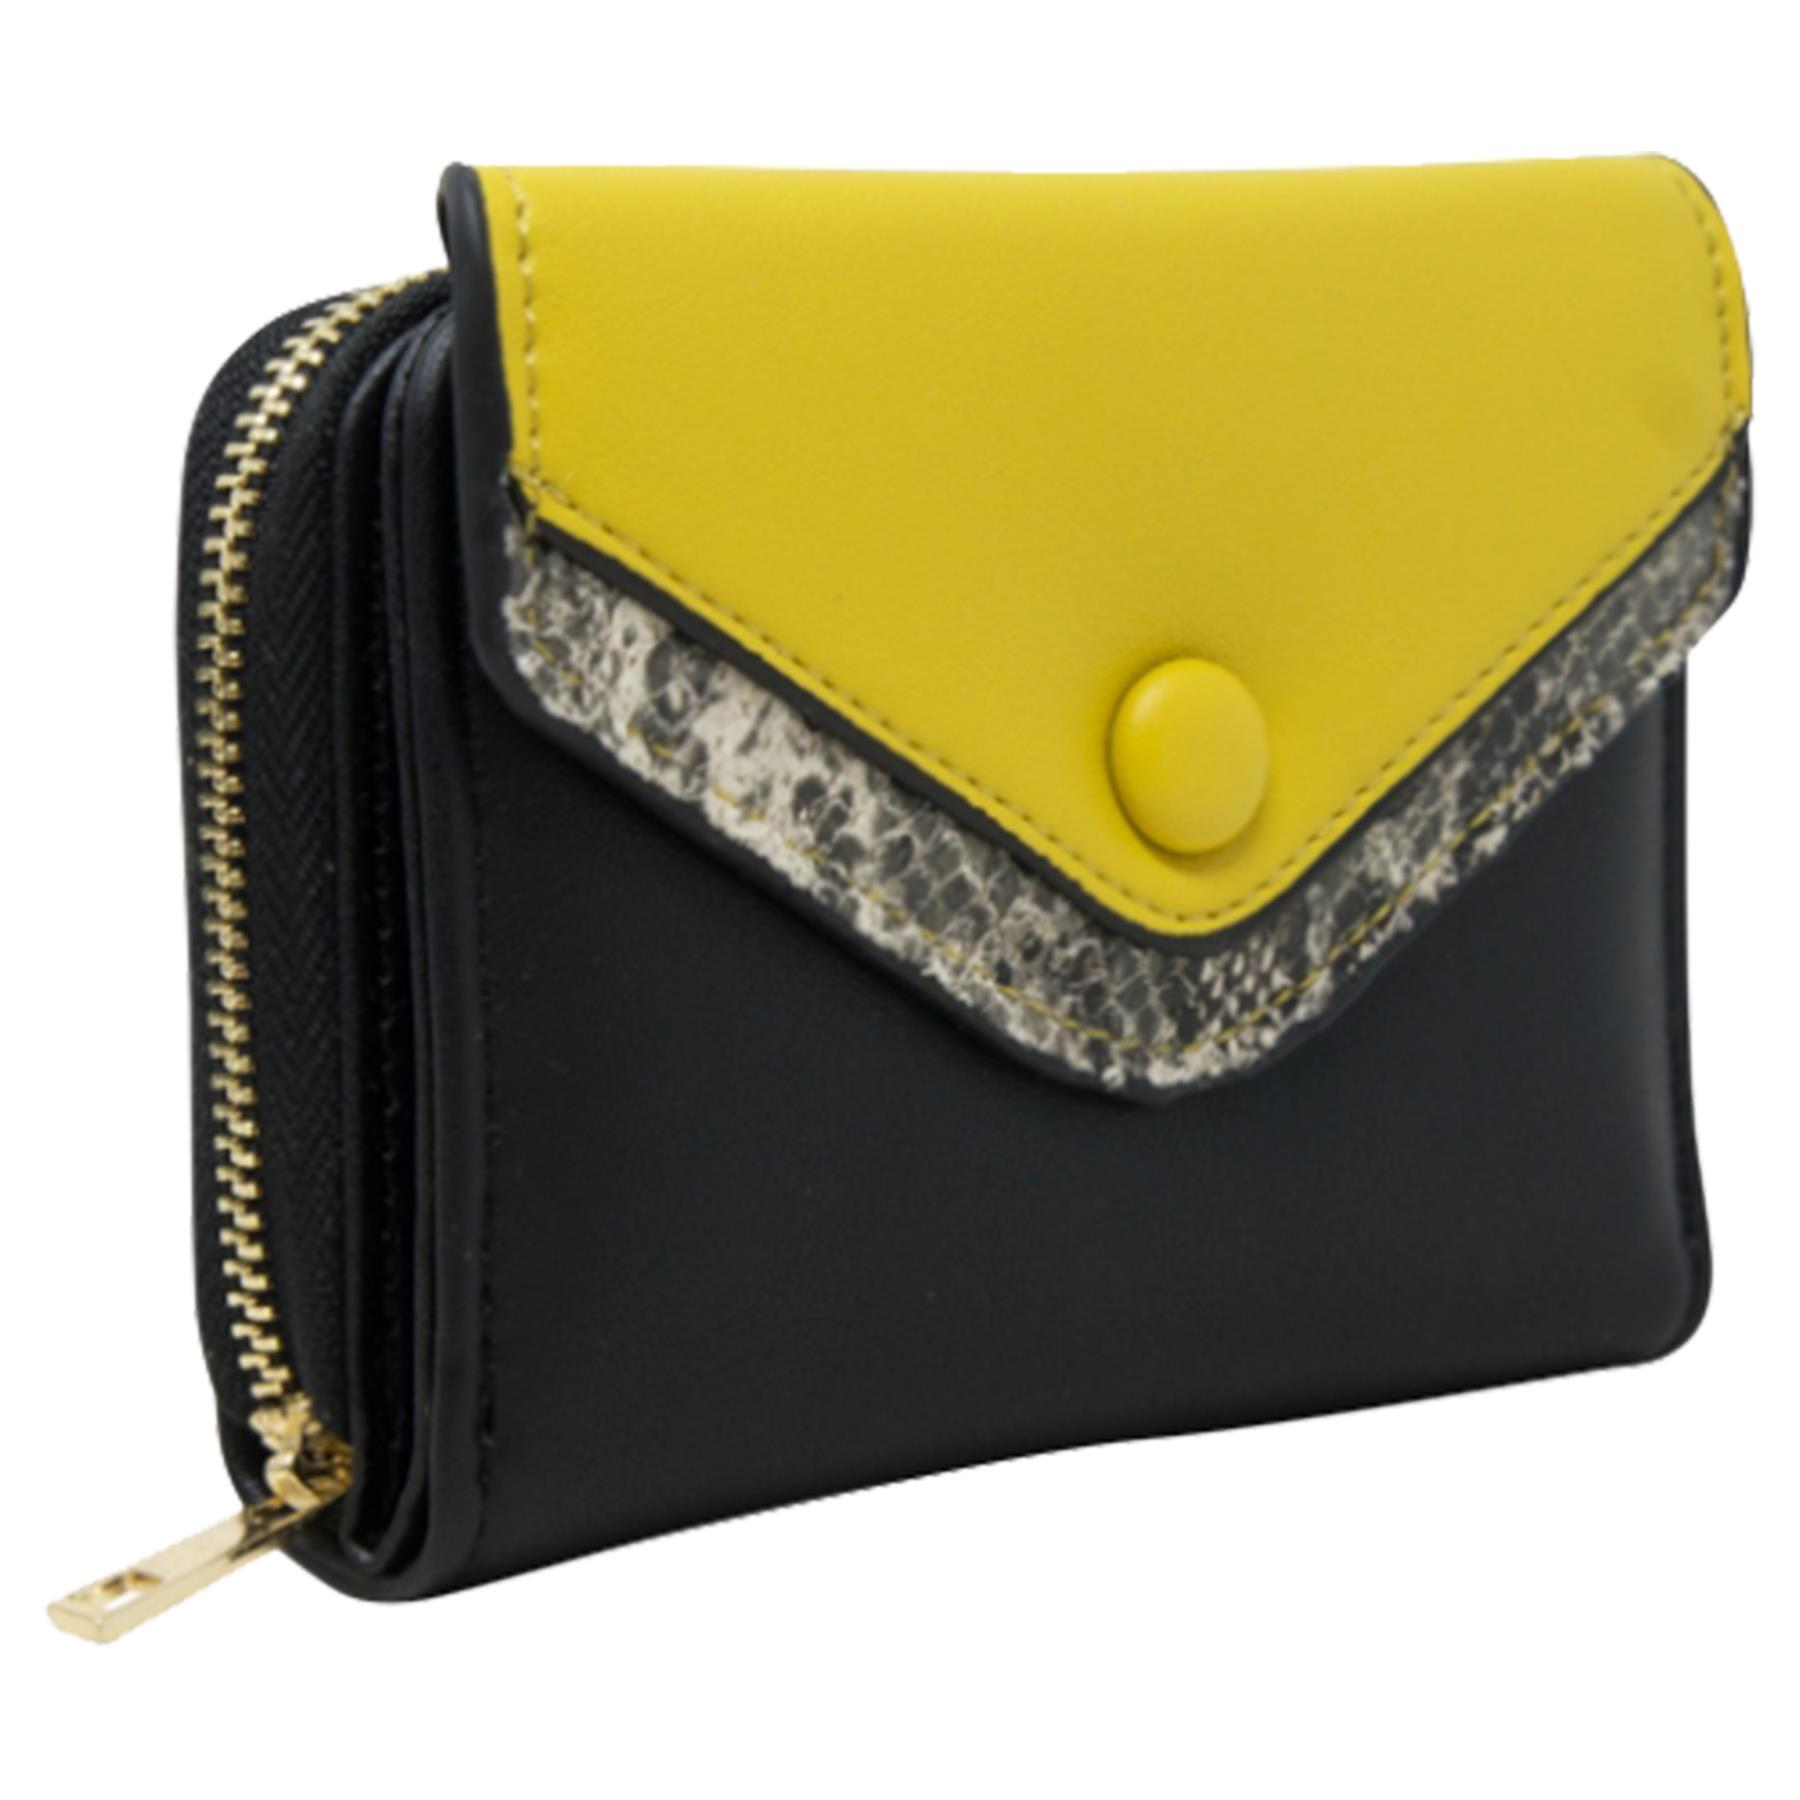 New-Ladies-Multicoloured-Envelope-Faux-Leather-Reptile-Detail-Purse thumbnail 7